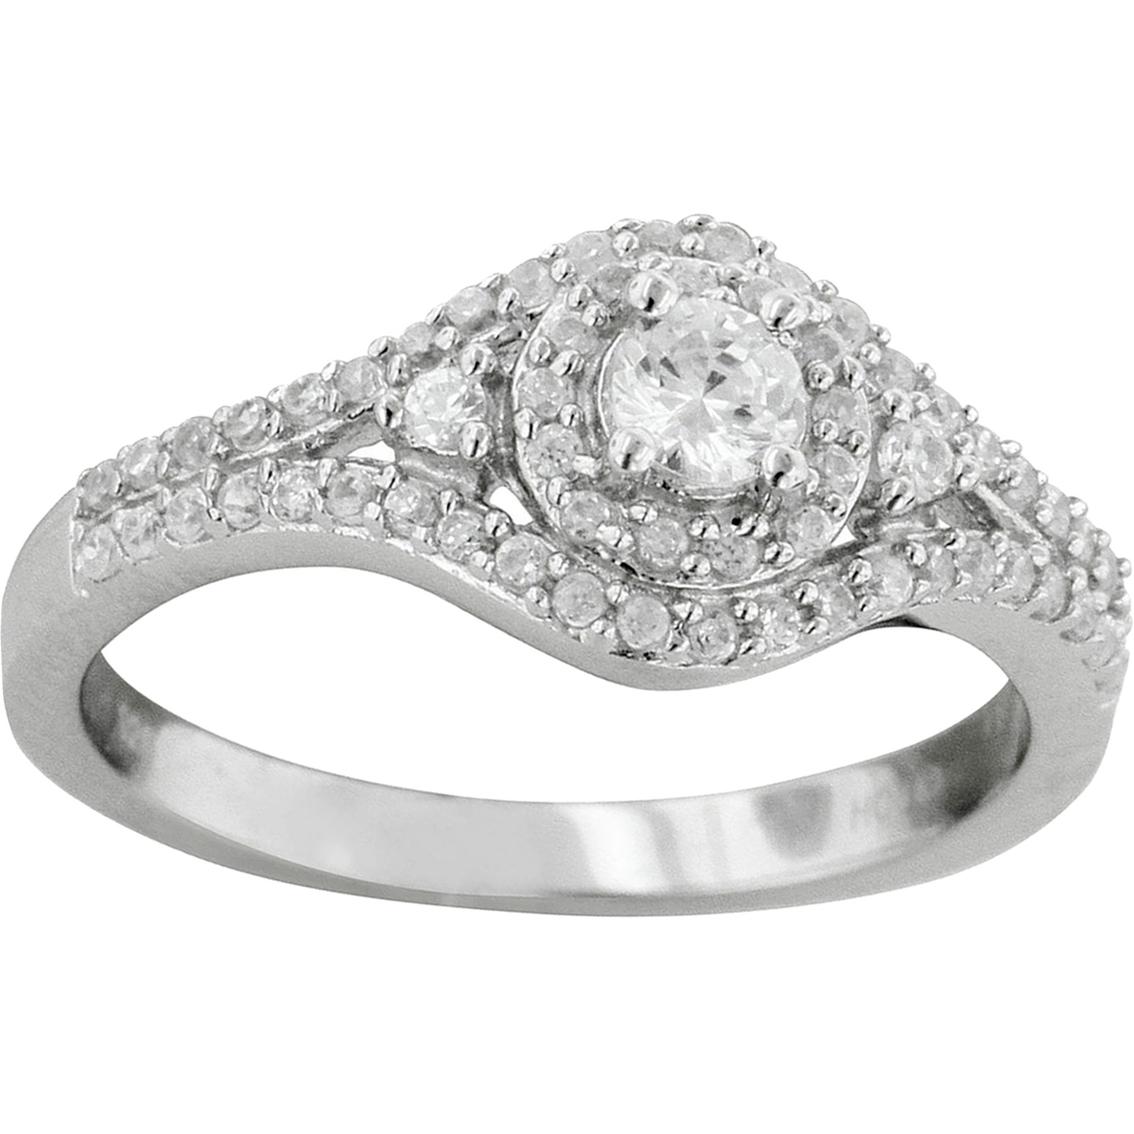 10k White Gold 1/2 Ctw Diamond Engagement Ring